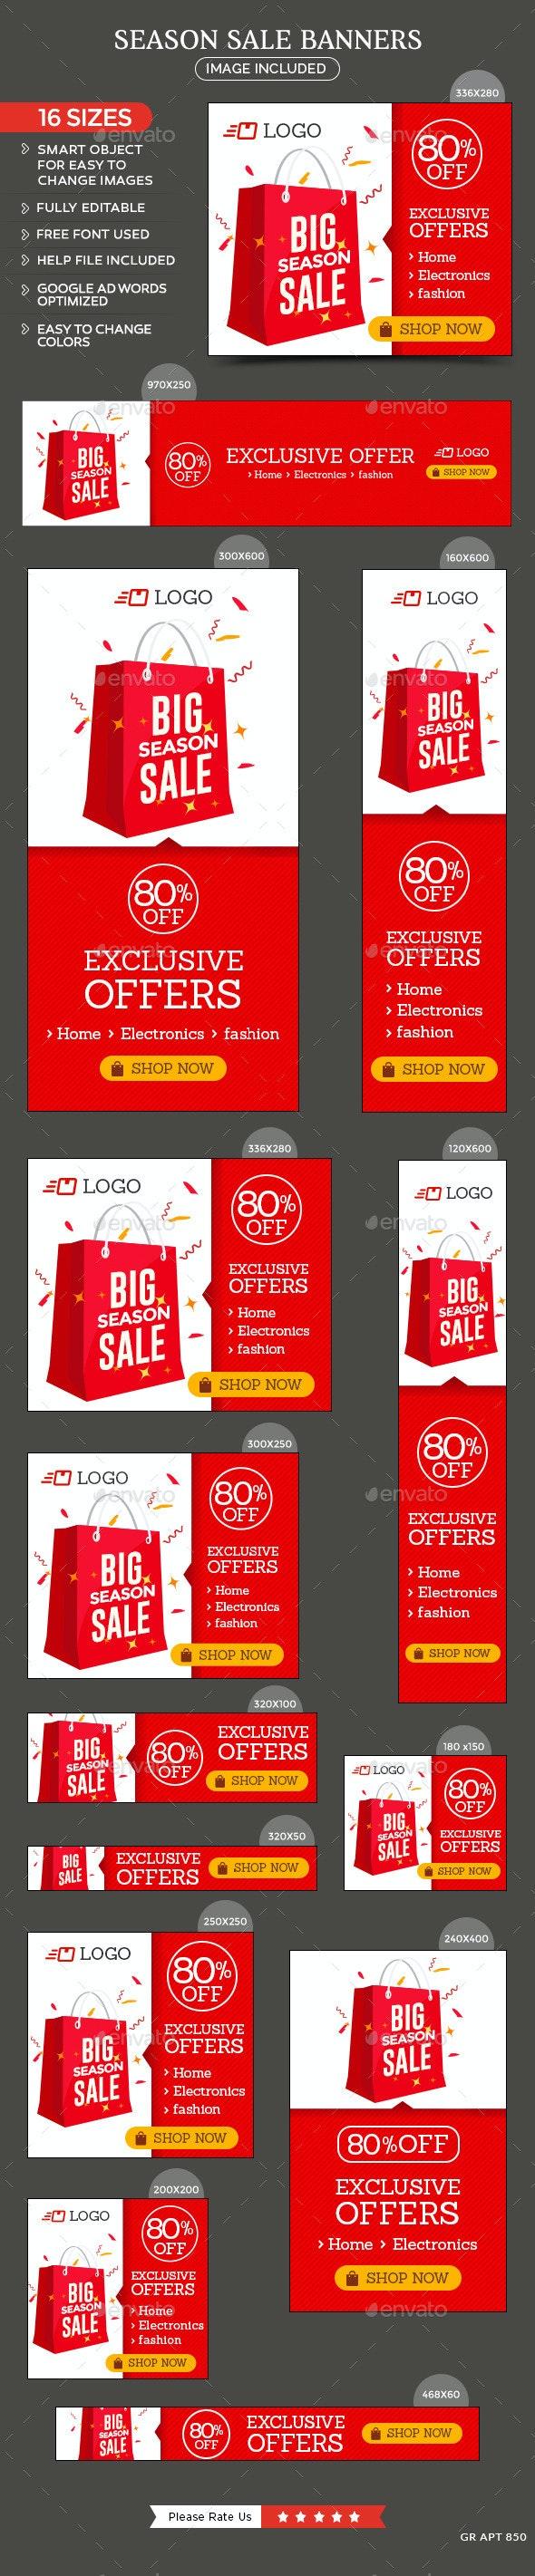 Season Sale Banners - Banners & Ads Web Elements